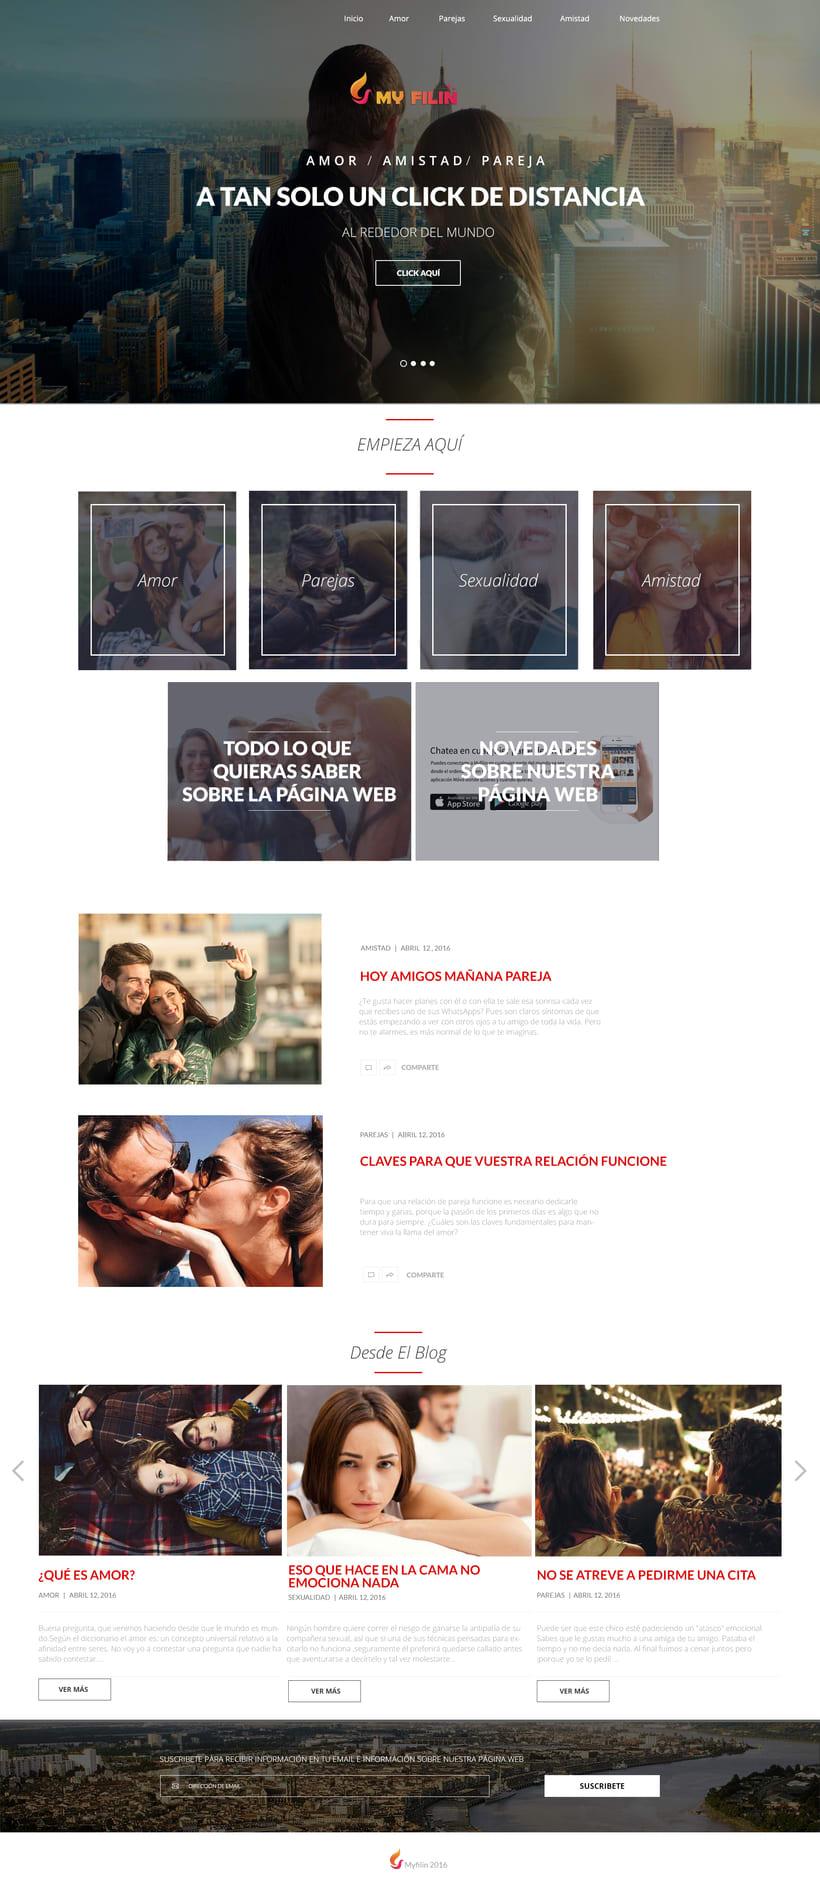 Diseño de Blog de myfili -1